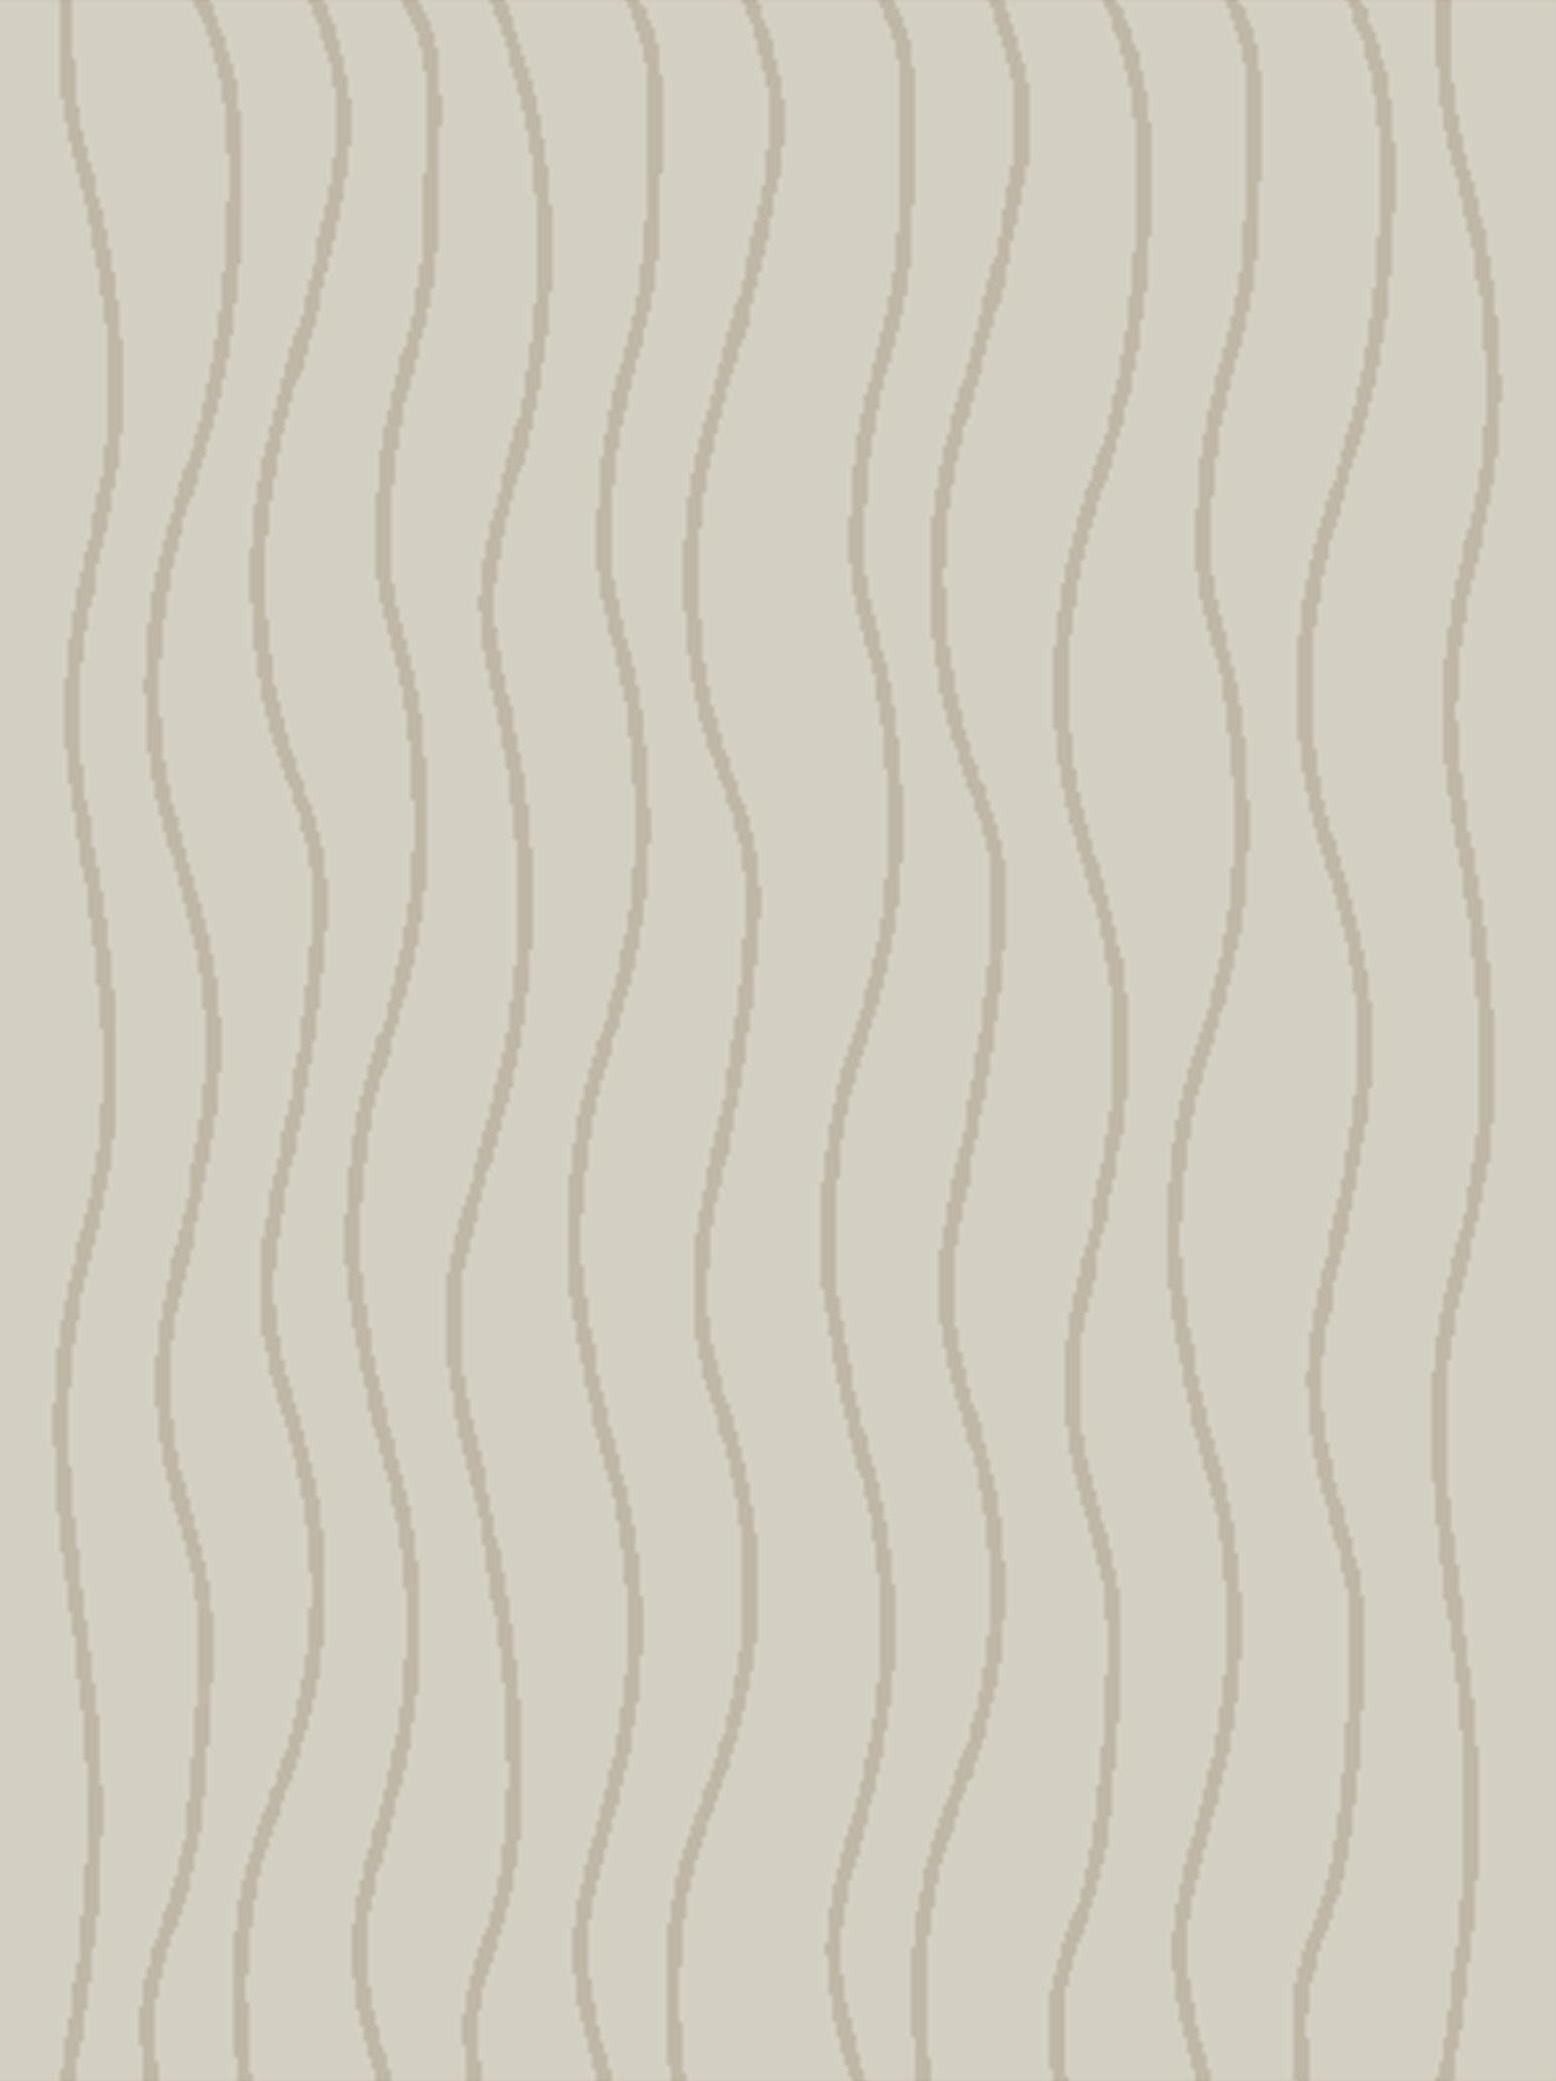 BREAKING WAVES in Grey